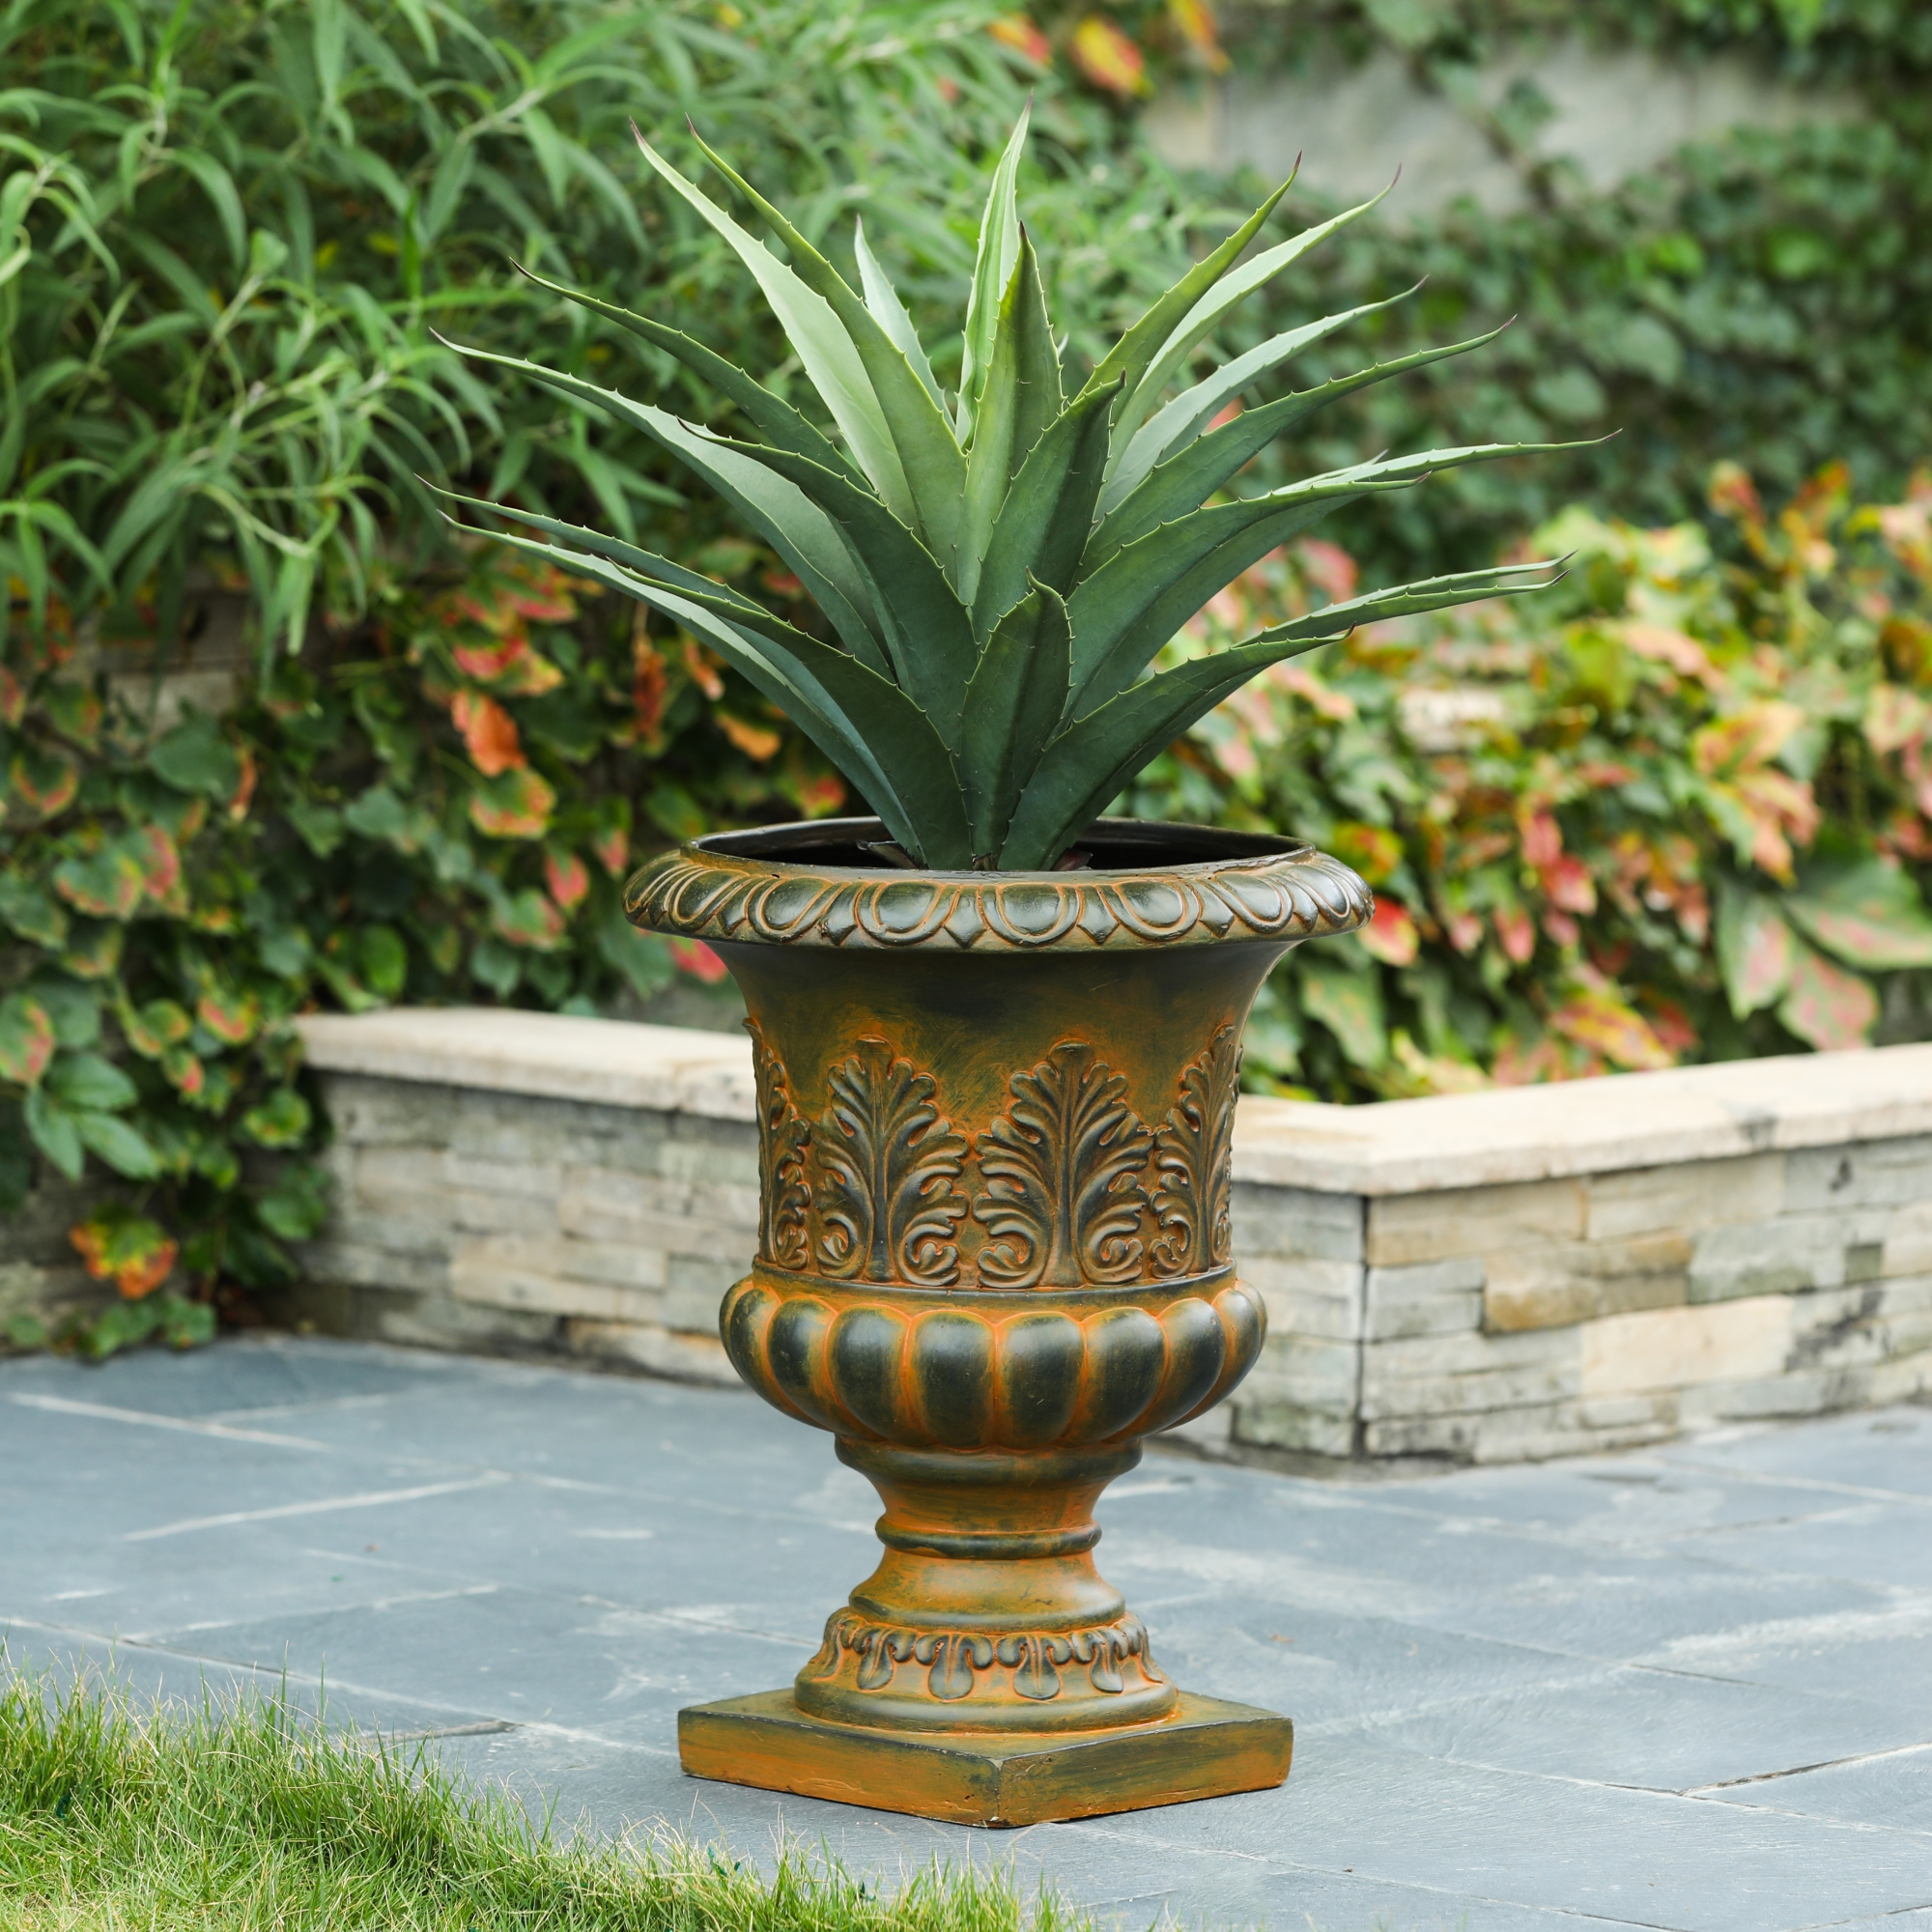 Luxen Home WH040 Classic Rustic Urn Planter  Bronze